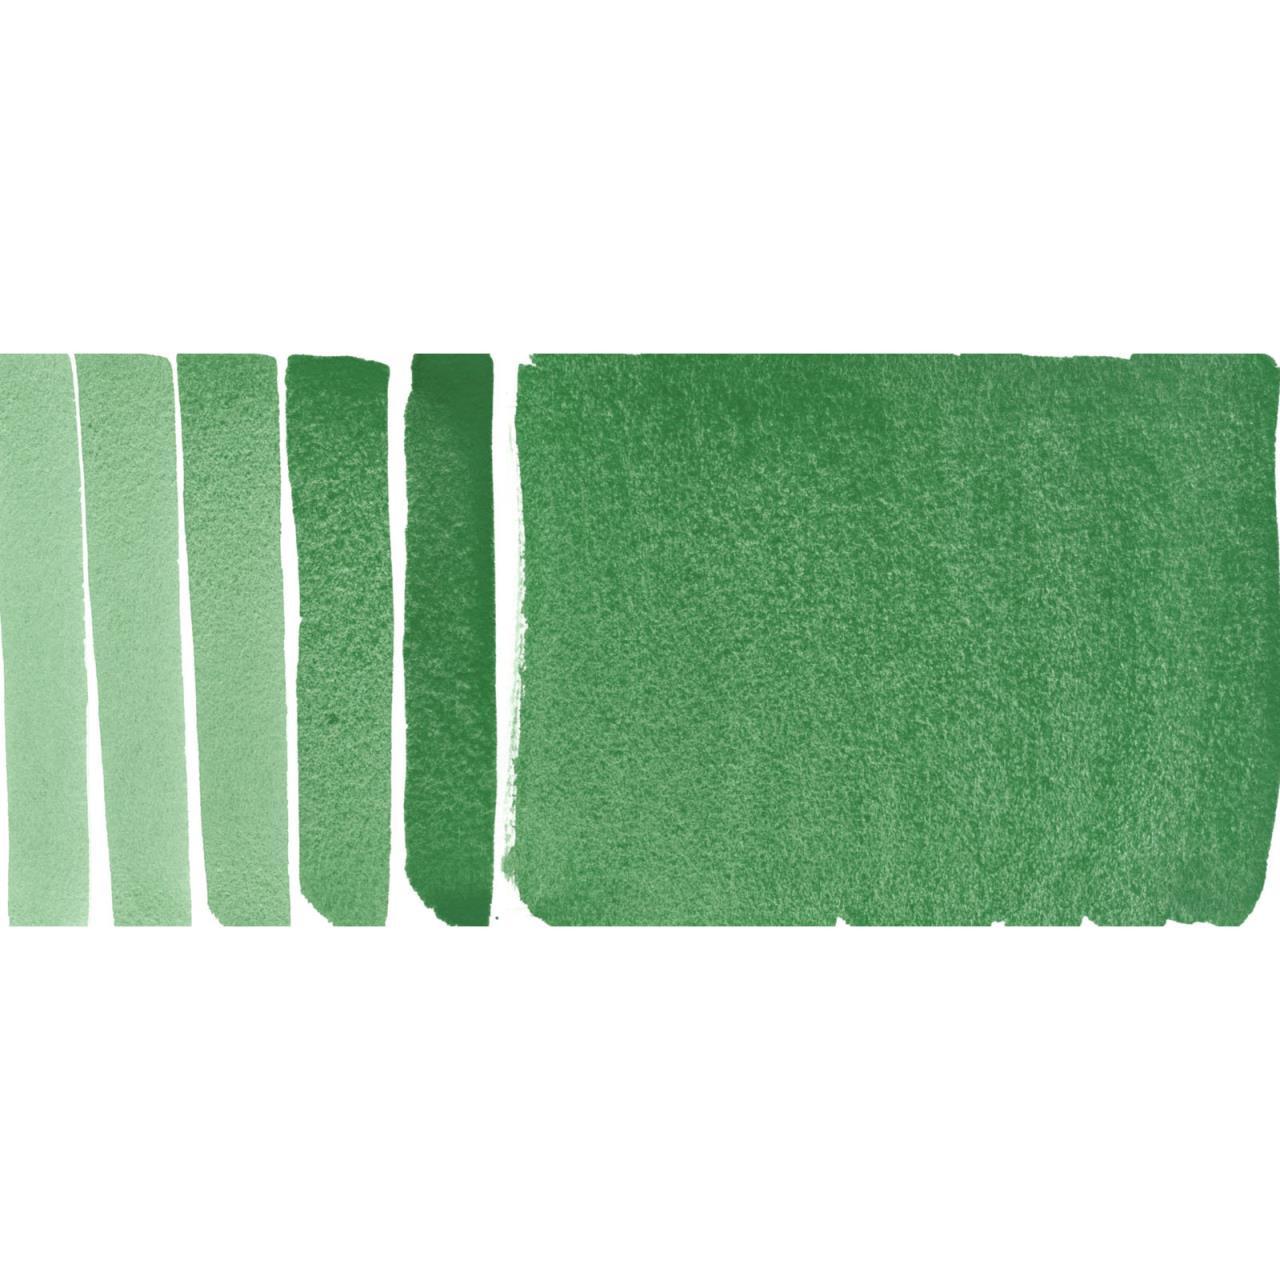 Cobalt Green, DANIEL SMITH Extra Fine Watercolors 15ml Tubes -